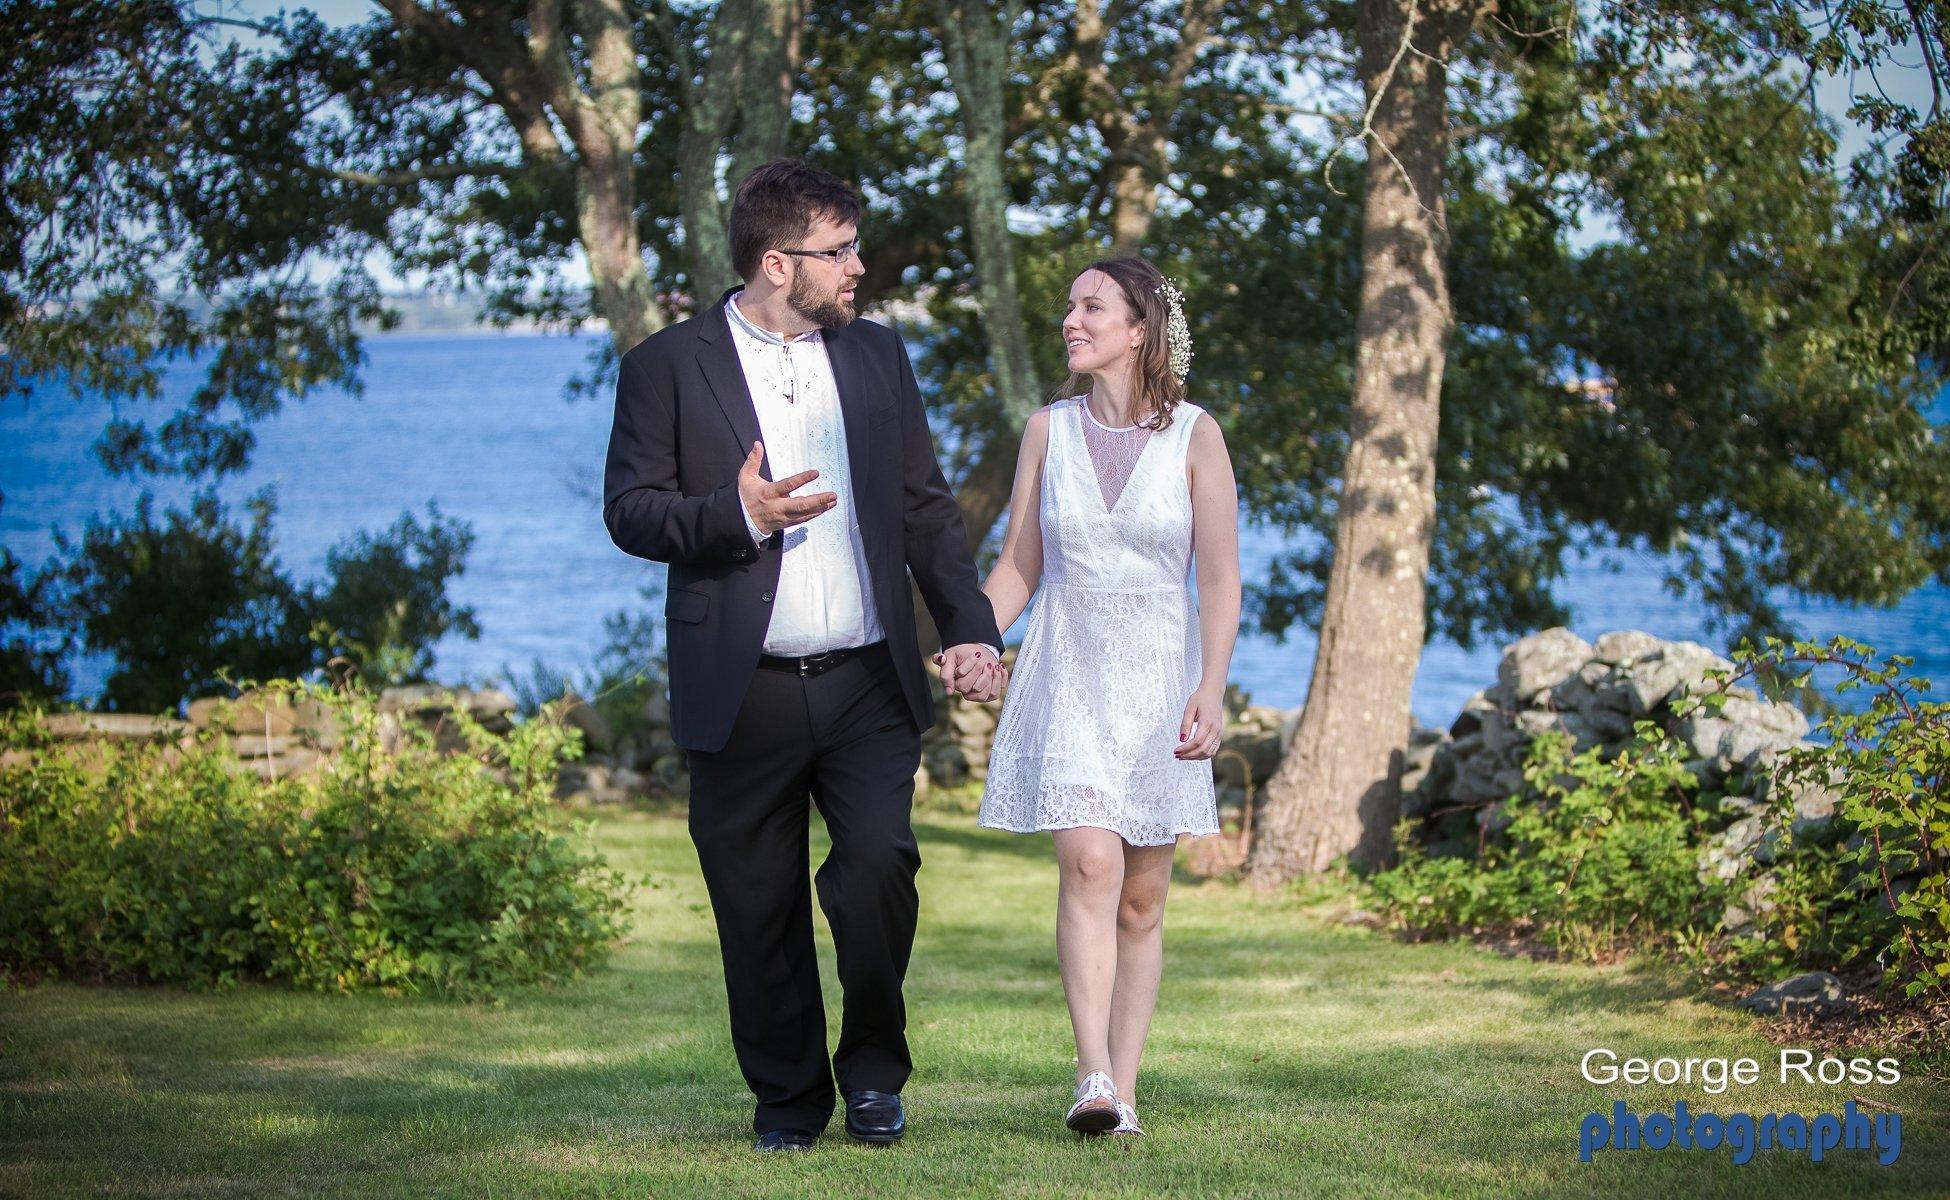 Wedding photography: Back Yard Wedding, Jamestown, Rhode Island